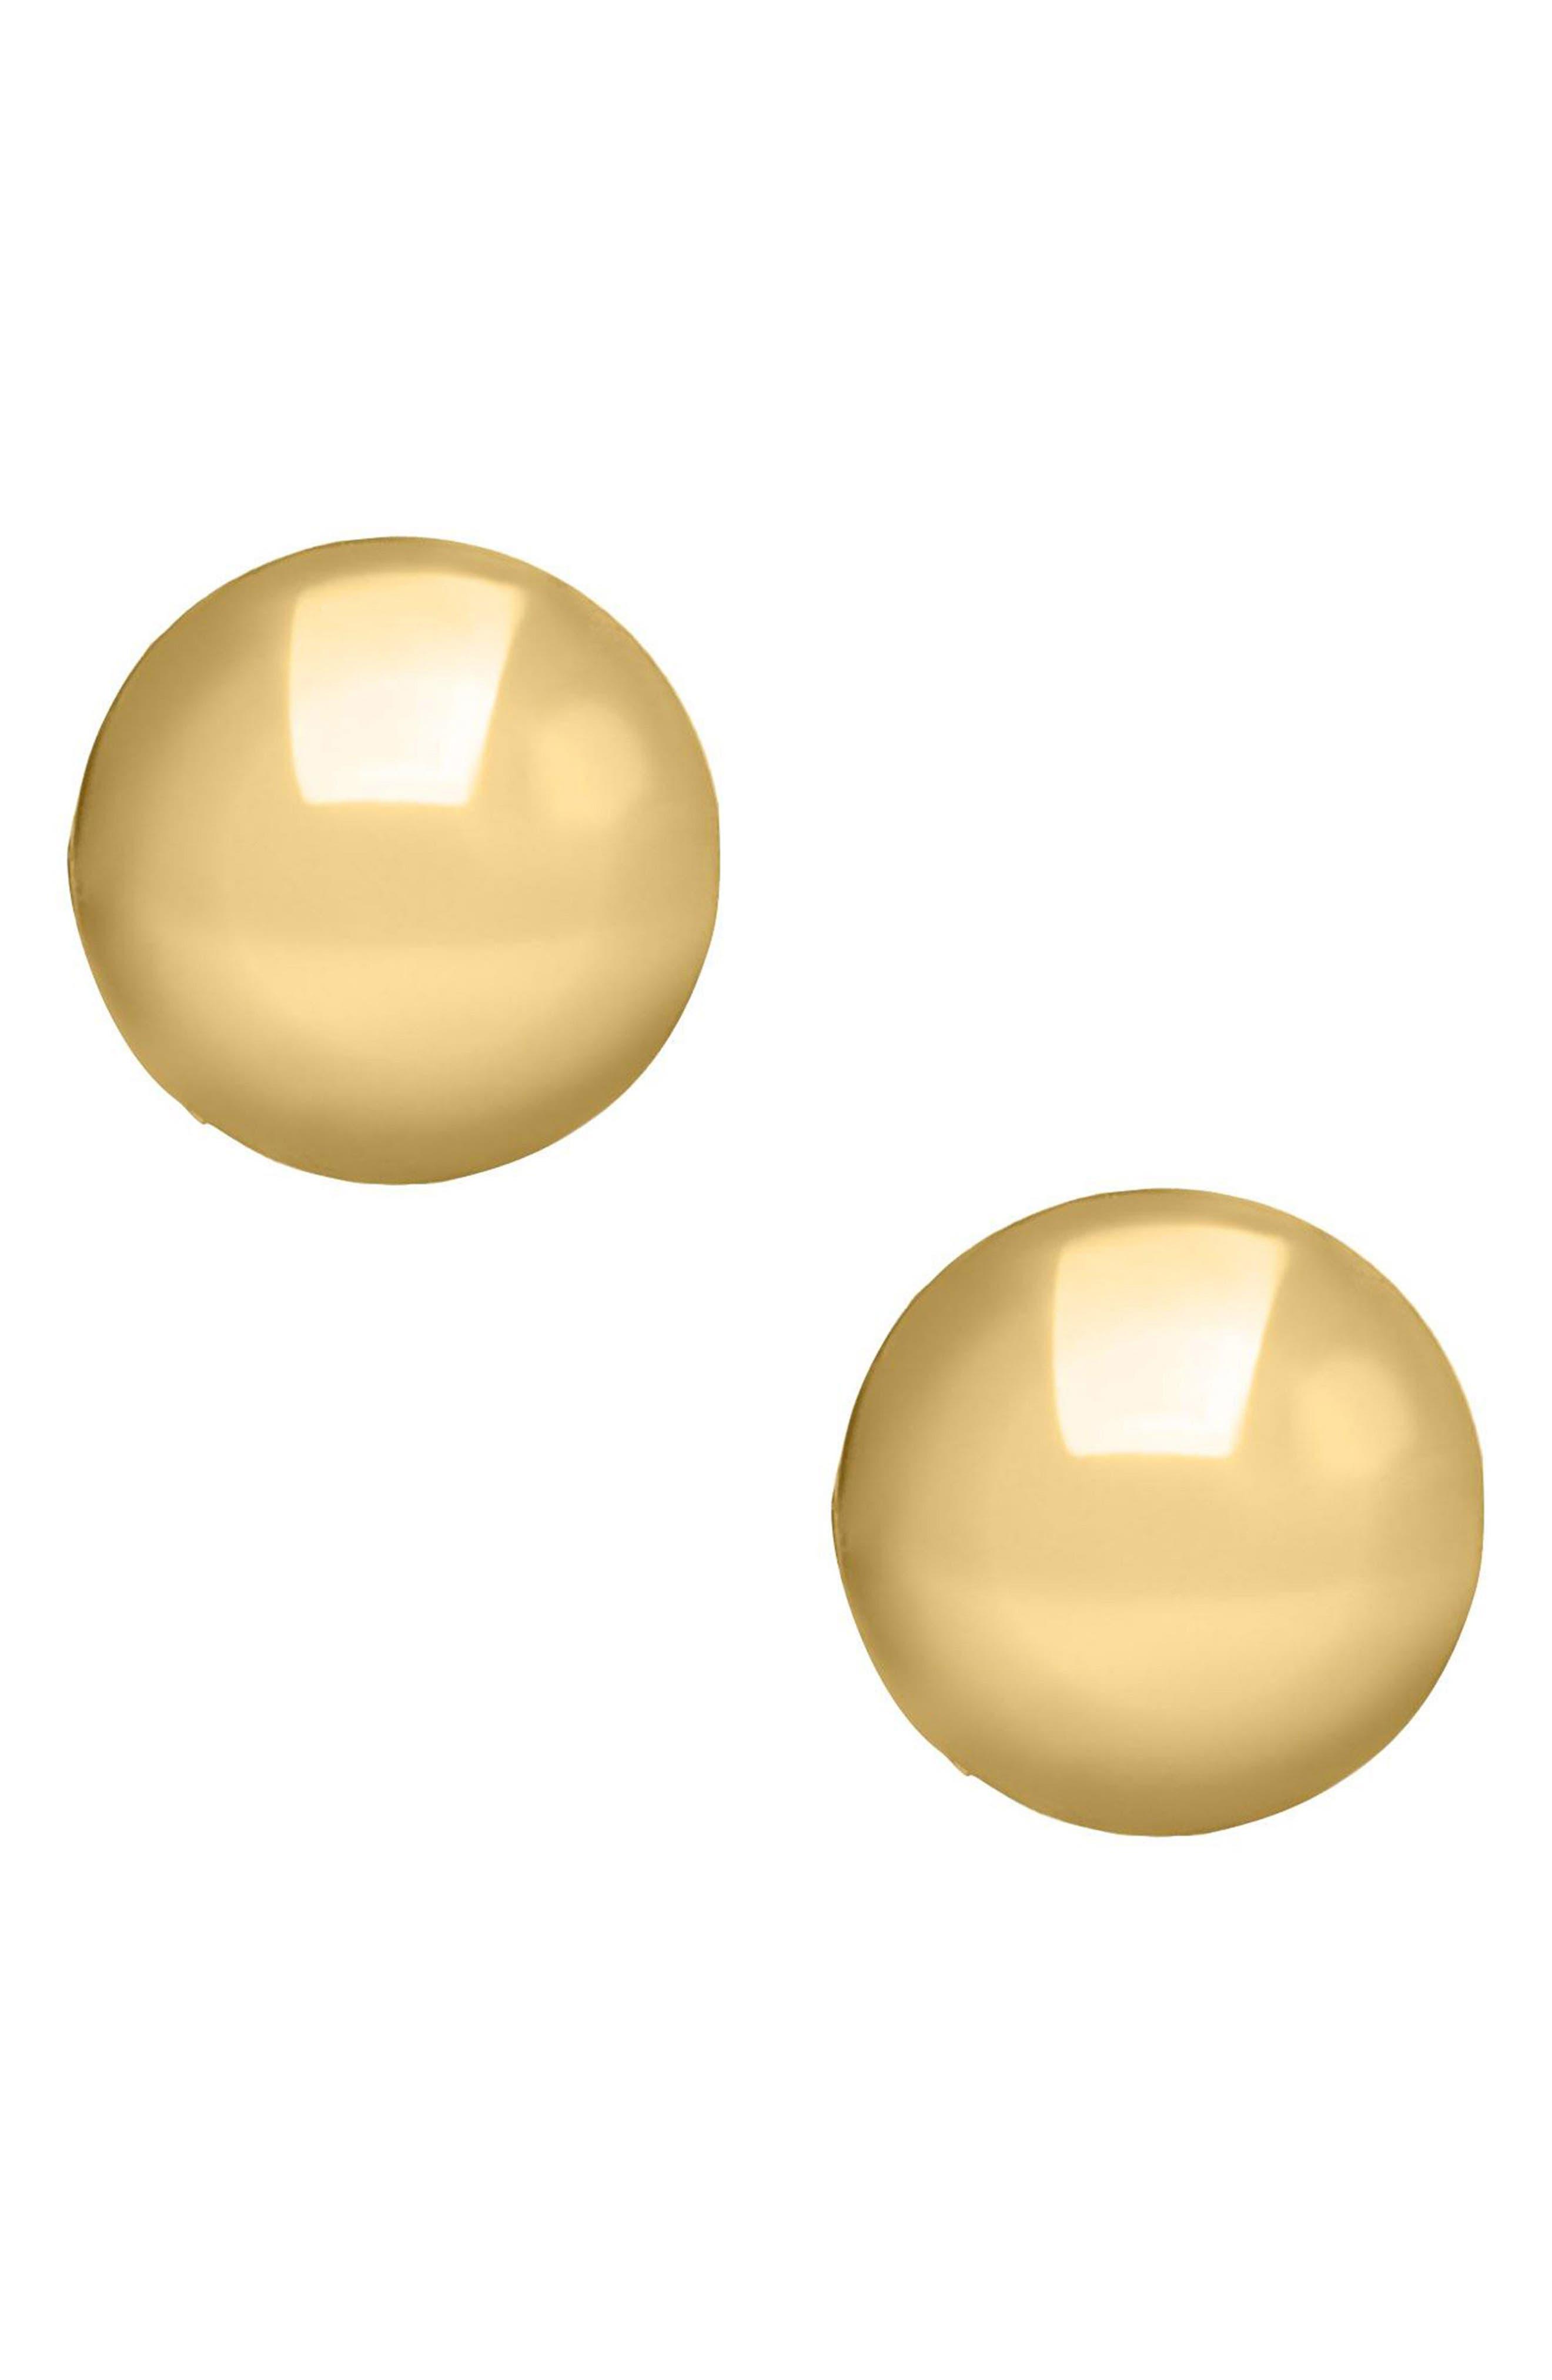 14k Gold Ball Earrings,                         Main,                         color, GOLD